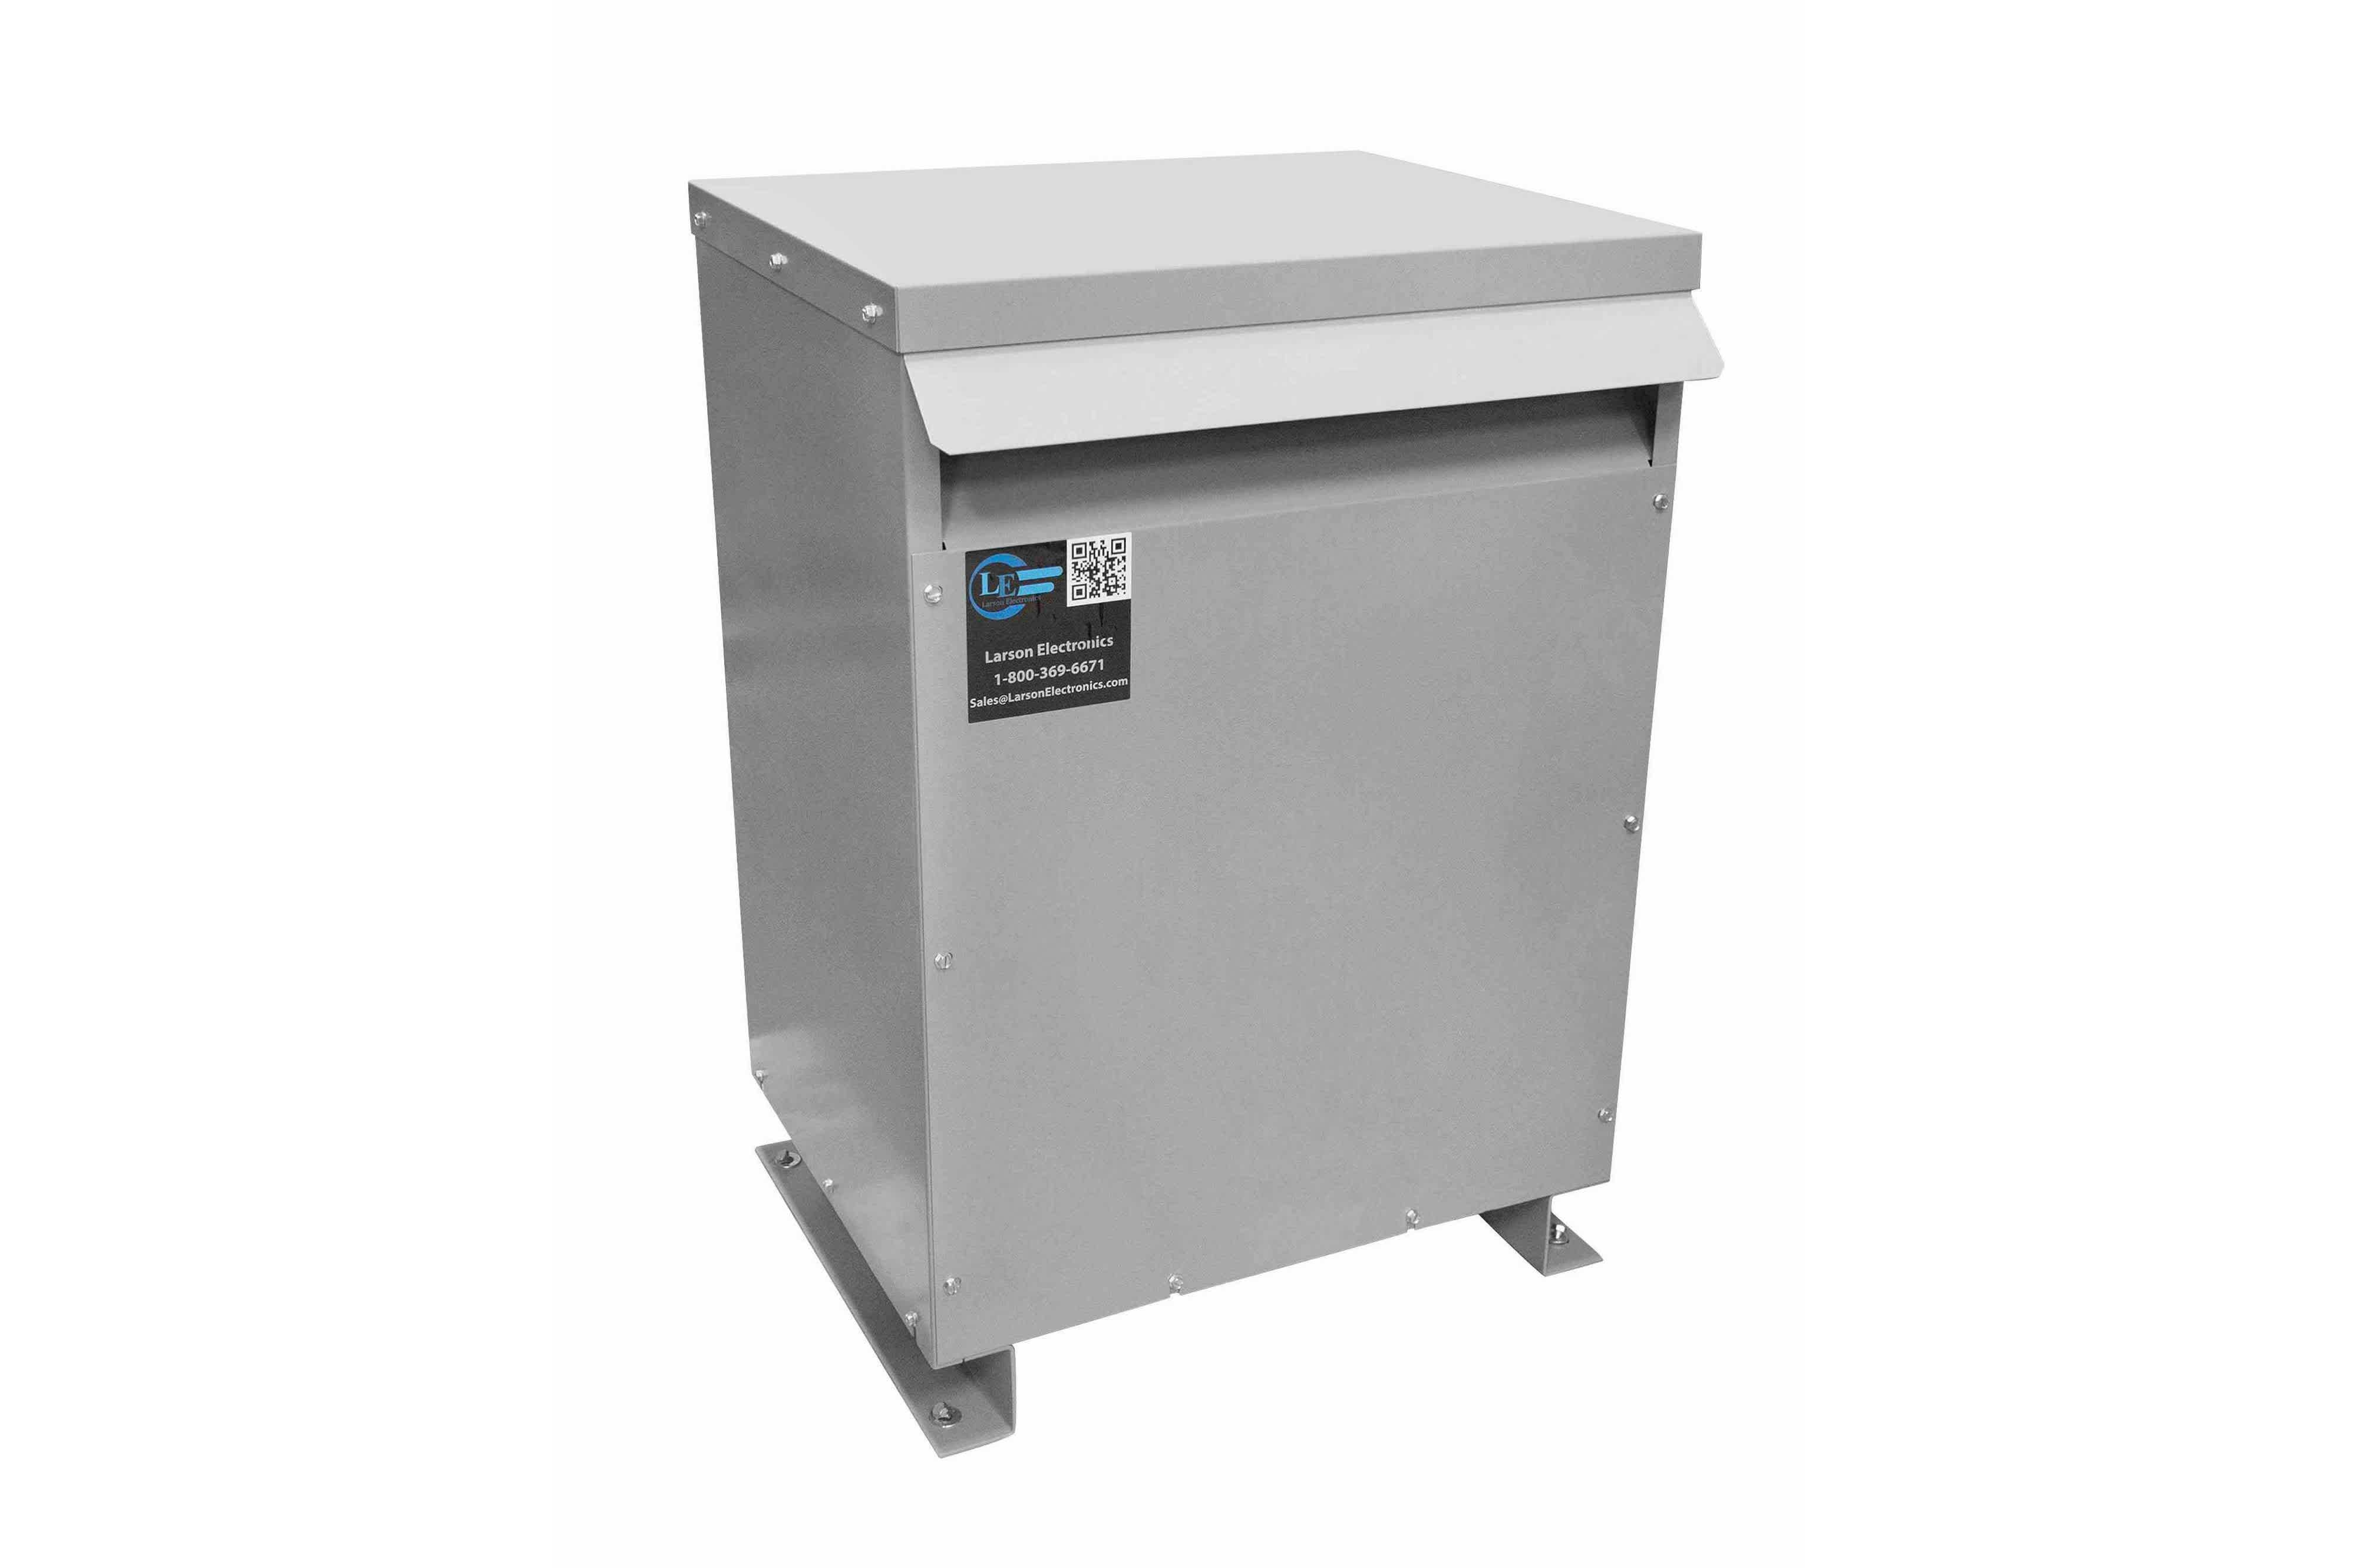 115 kVA 3PH Isolation Transformer, 600V Wye Primary, 480V Delta Secondary, N3R, Ventilated, 60 Hz